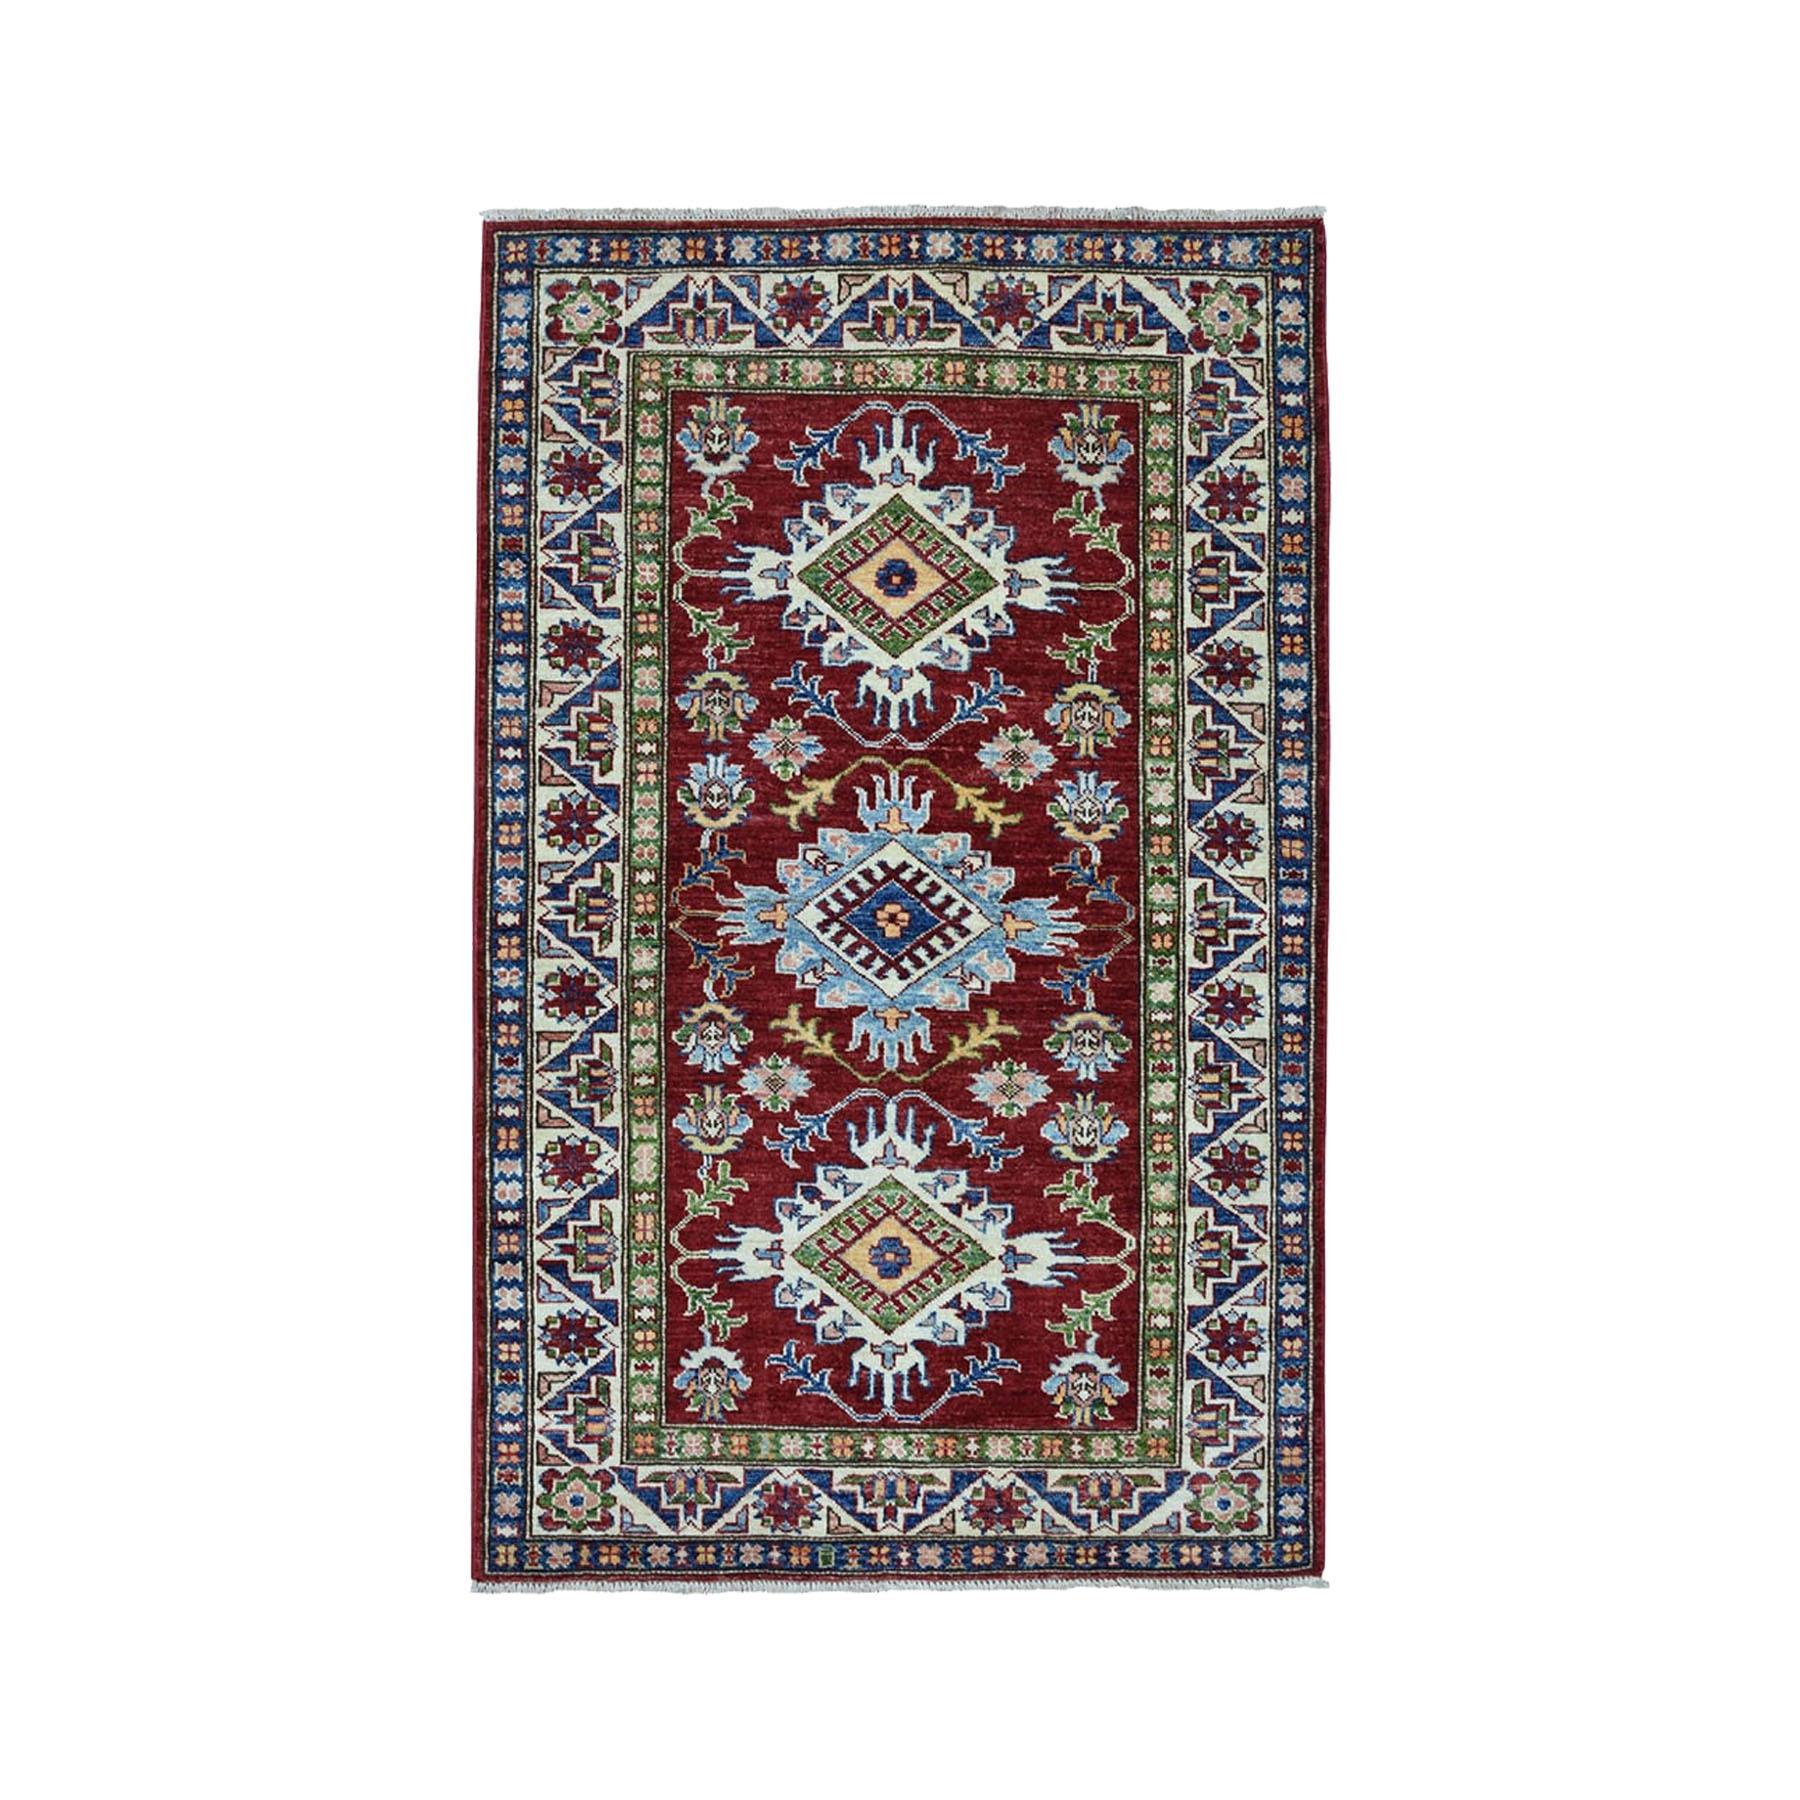 "3'3""X4'8"" Blue Super Kazak Pure Wool Geometric Design Hand-Knotted Oriental Rug moae009d"